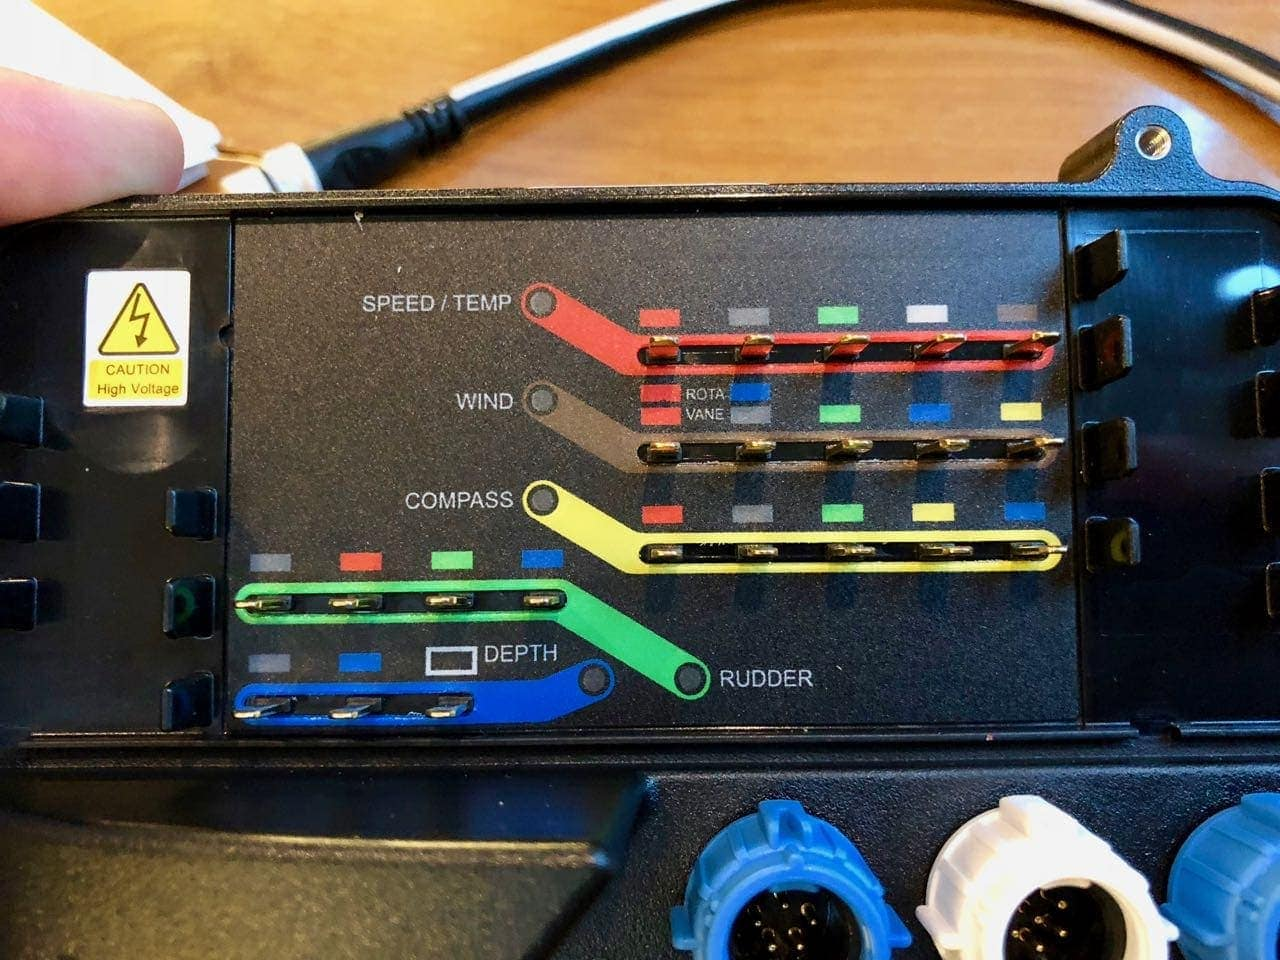 Raymarine ITC-5 simplifies older ST instruments